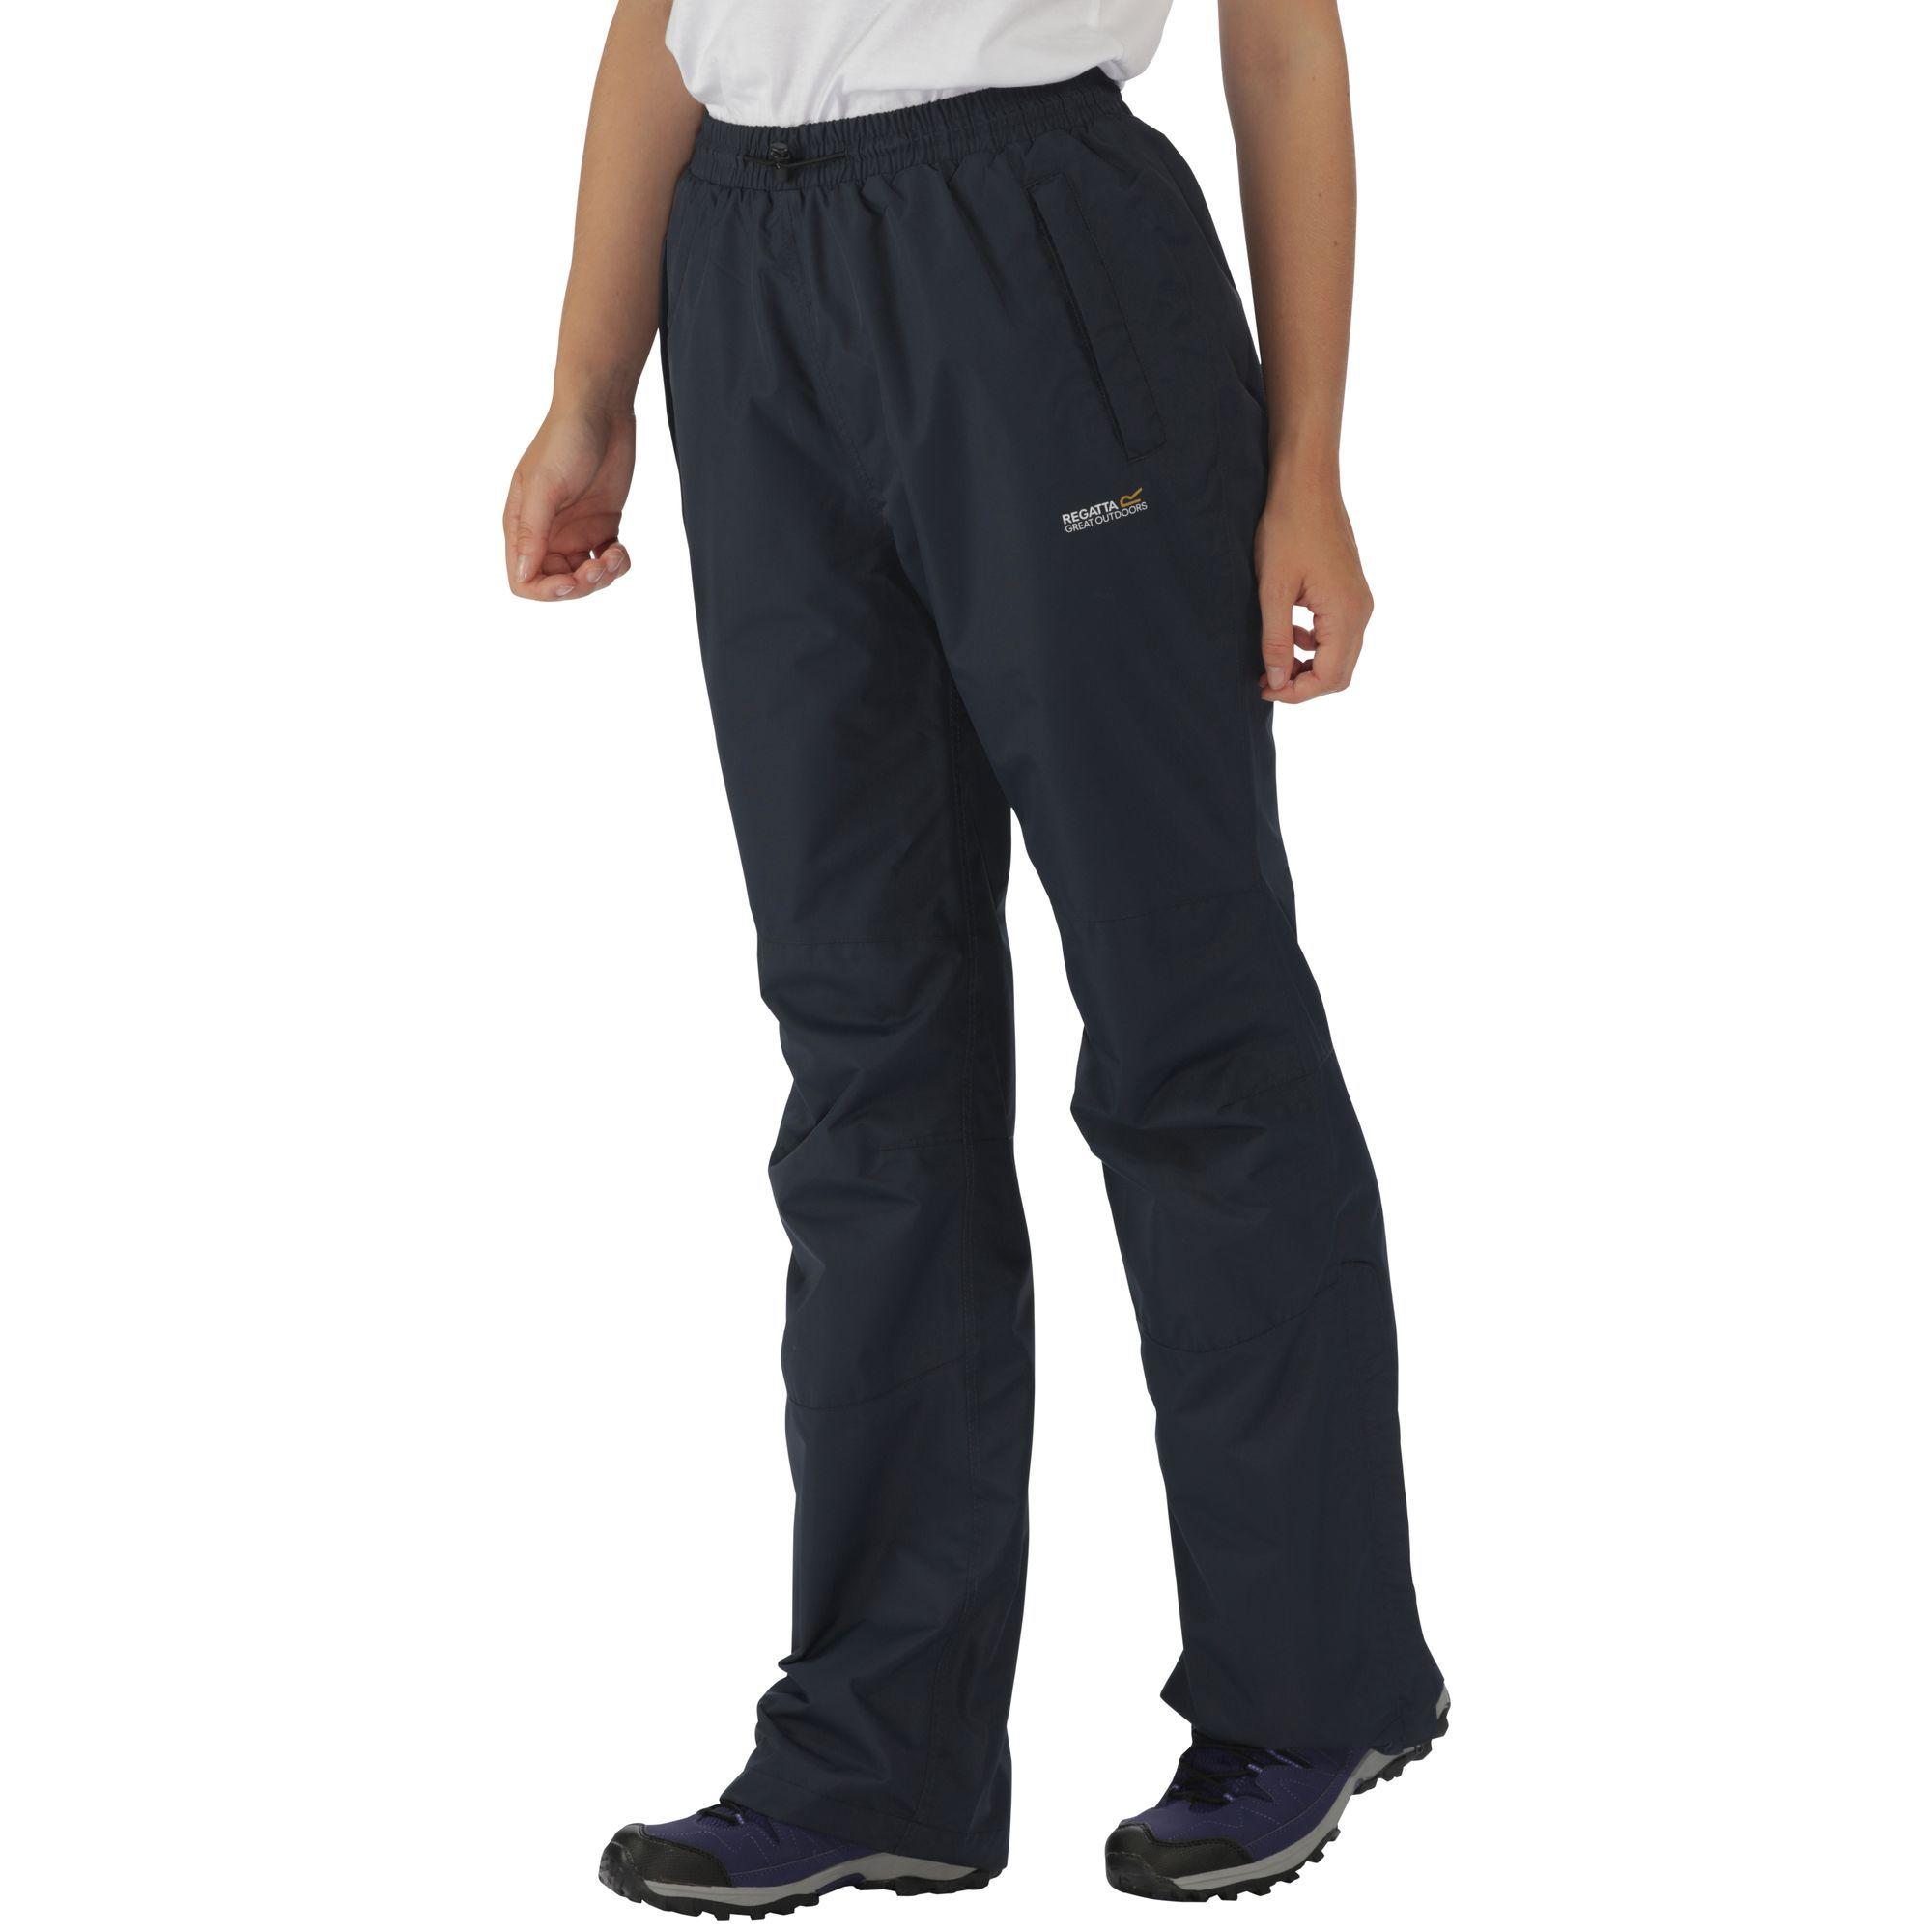 Regatta Great Outdoors Womens/Ladies Amelie III Waterproof Overtrousers (Long Leg)